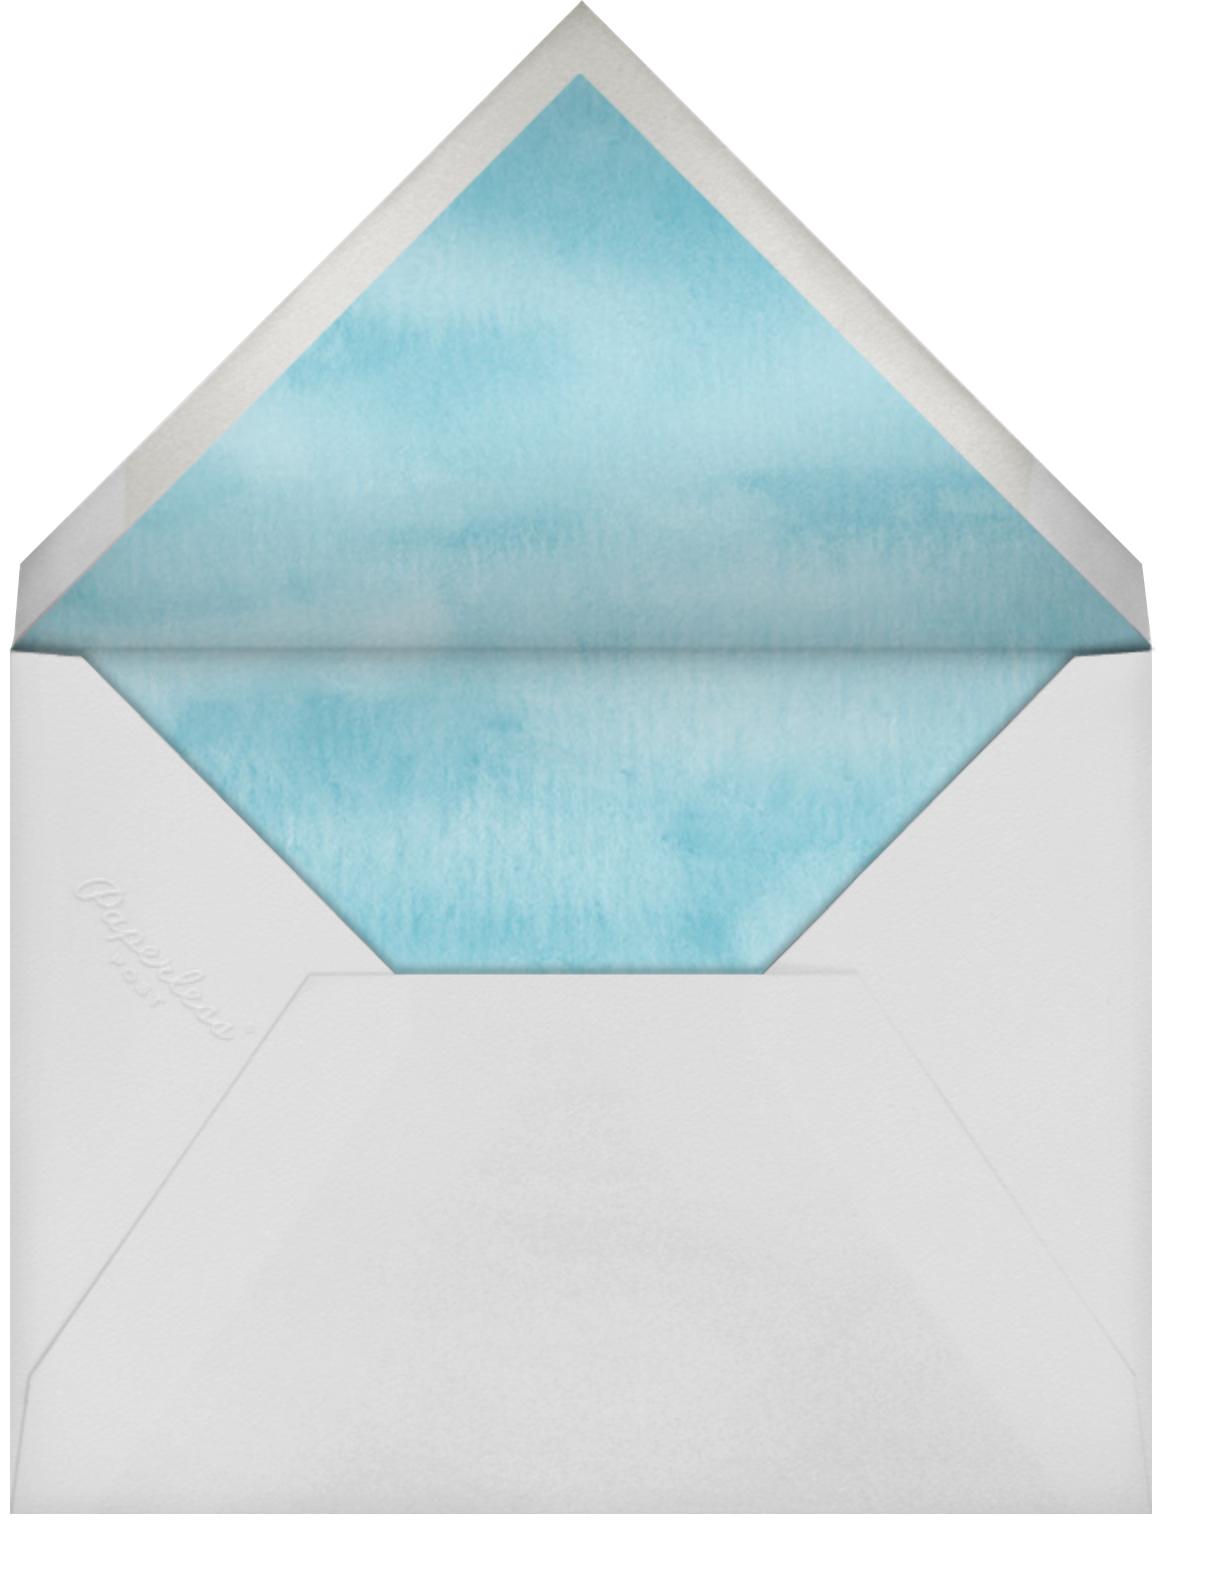 Key West - Felix Doolittle - Summer entertaining - envelope back